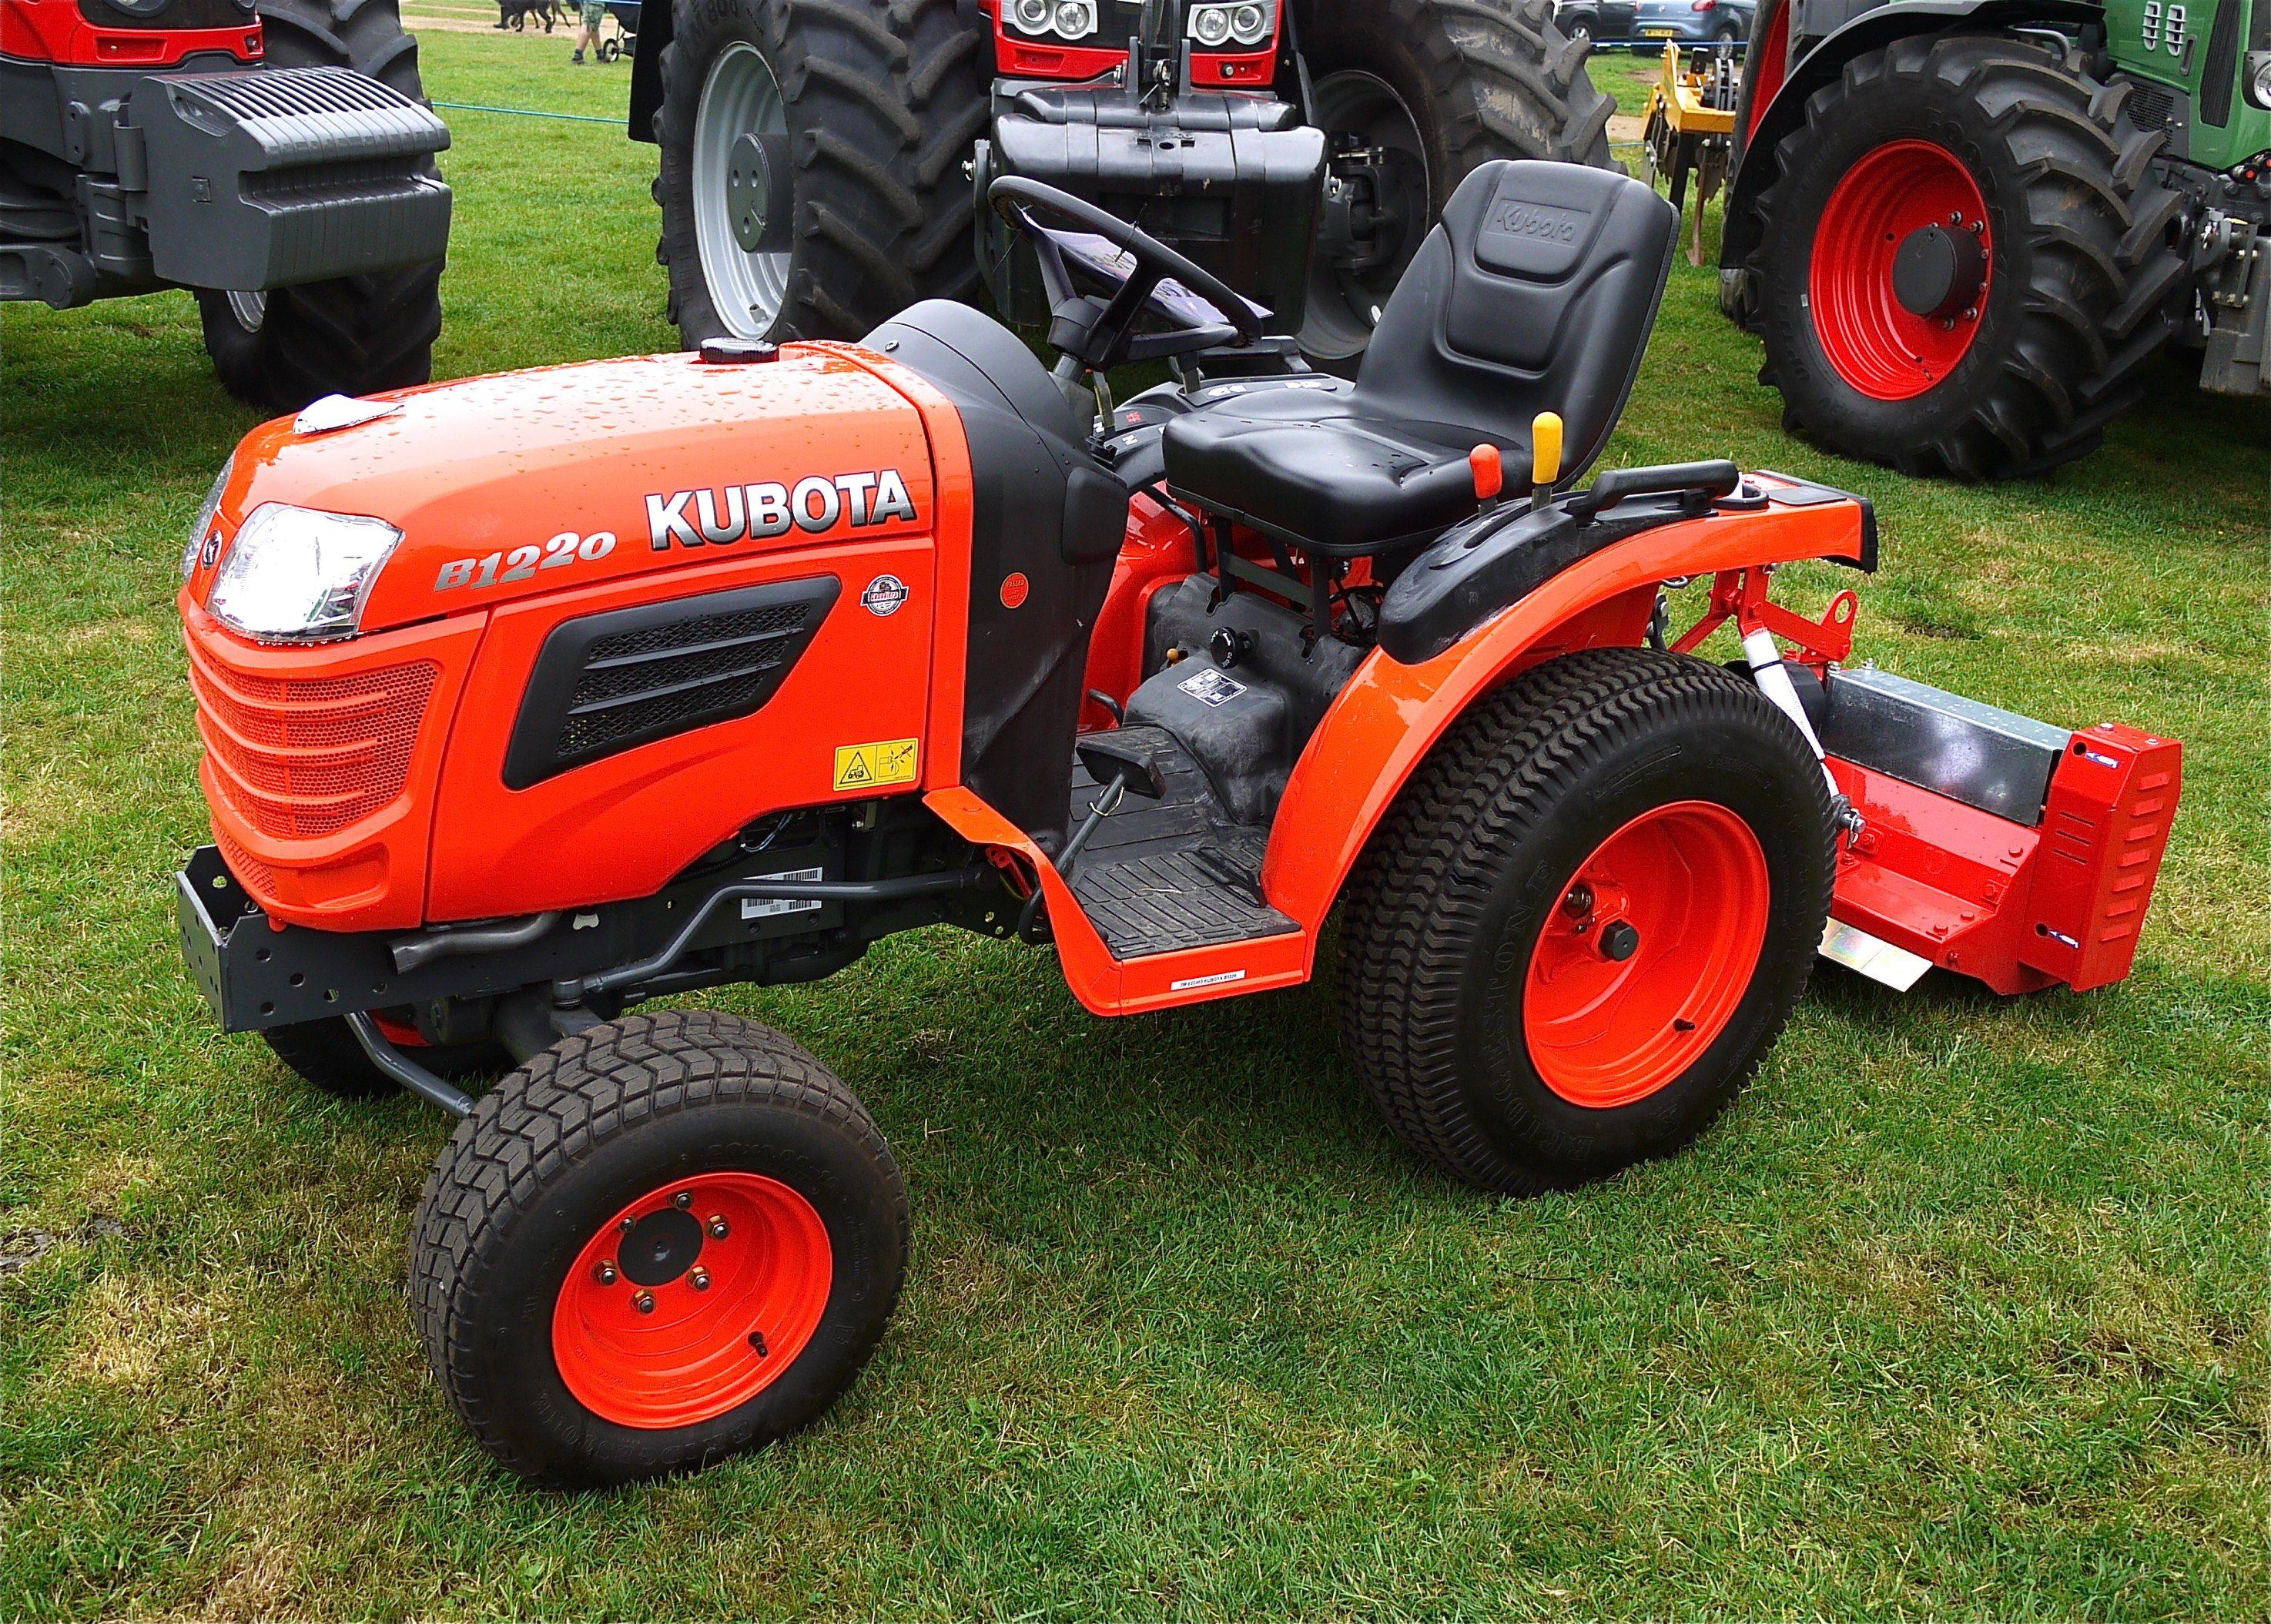 Kubota Tractors | Description Kubota Small Tractor -